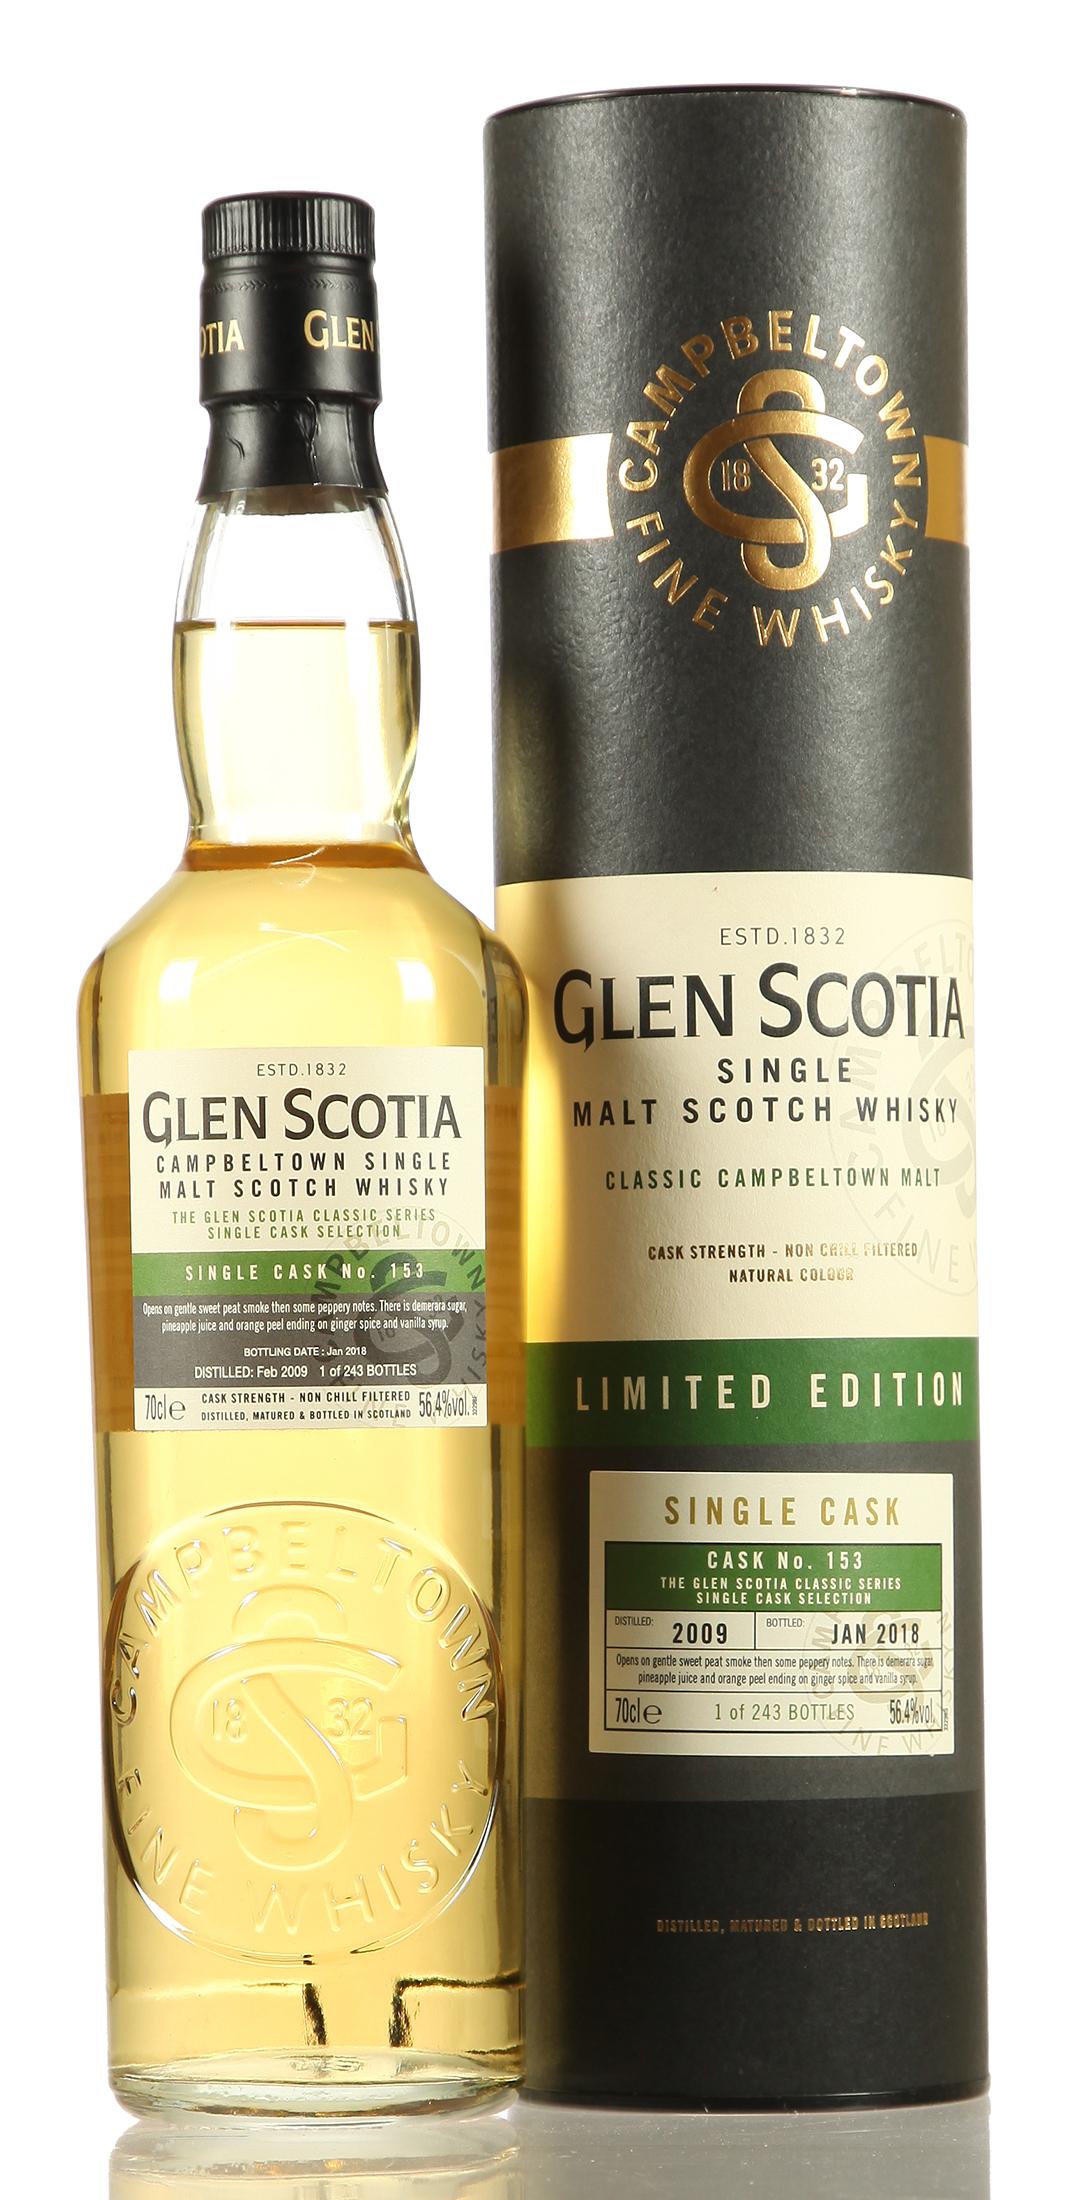 Glen Scotia Single Cask